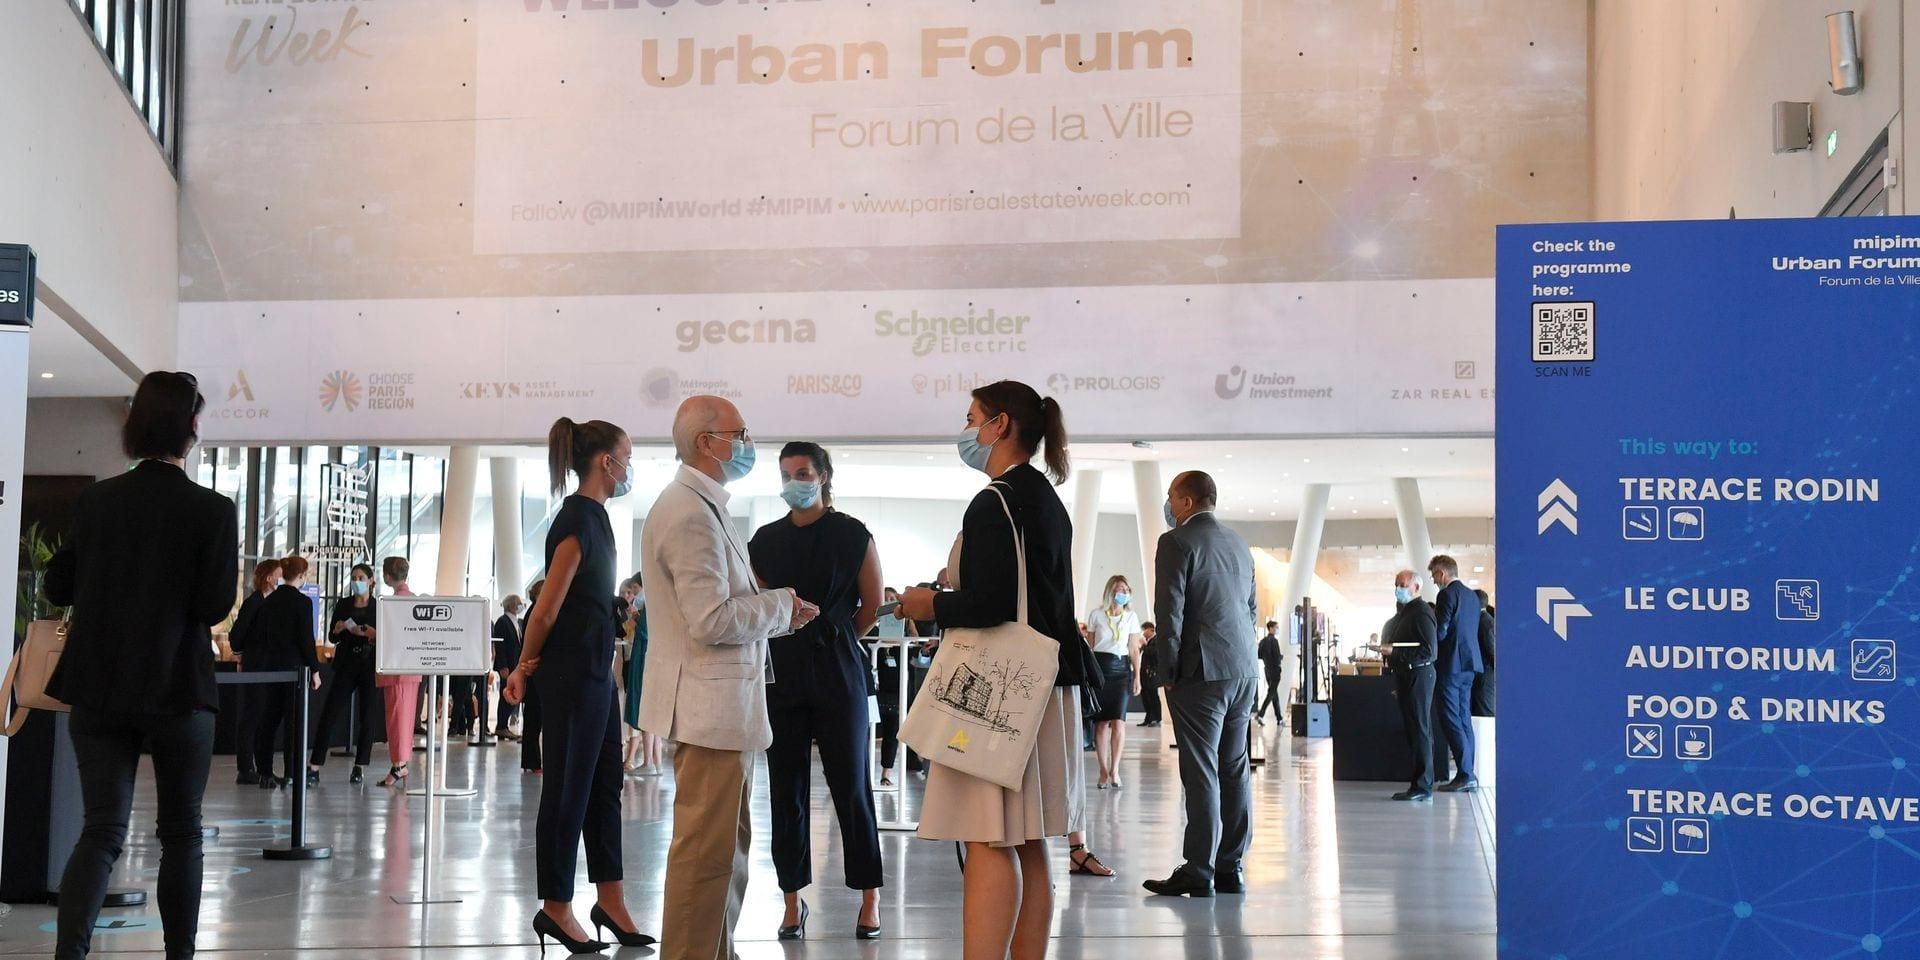 MIPIM URBAN FORUM 2020 - ATMOSPHERE - EXHIBITION AREA - NETWORKING ZONE